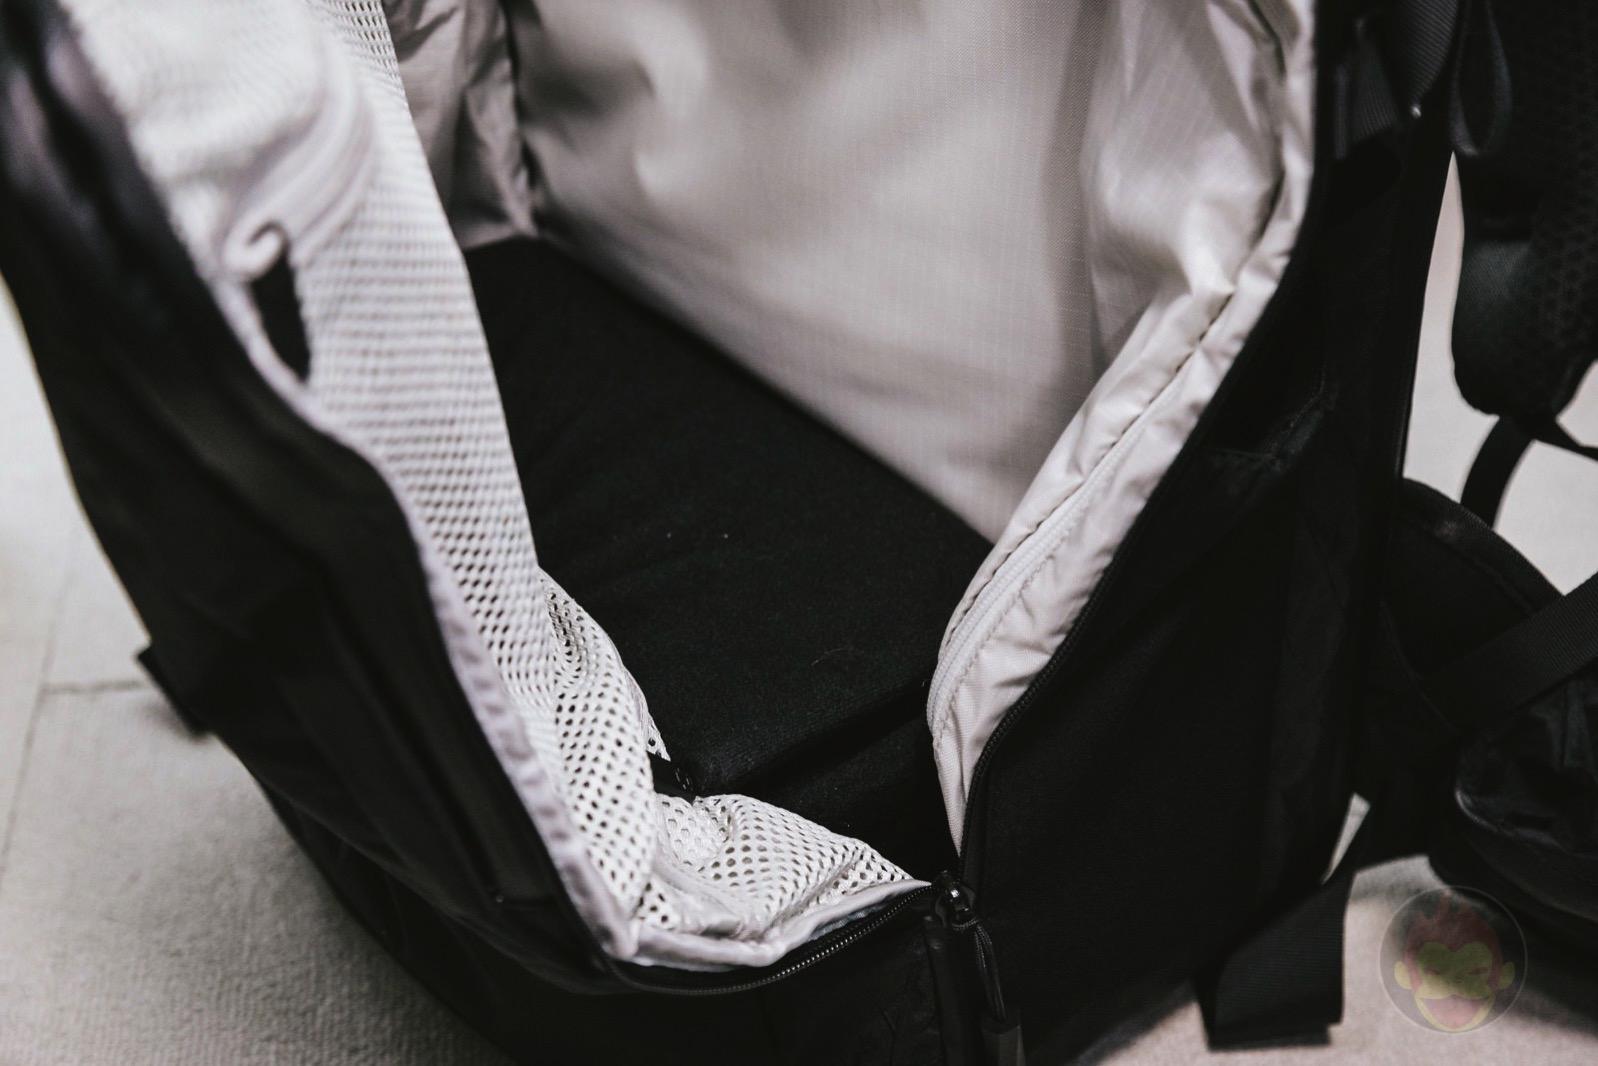 Hakuba-Camerabag-Innerbox-Review-08.jpg